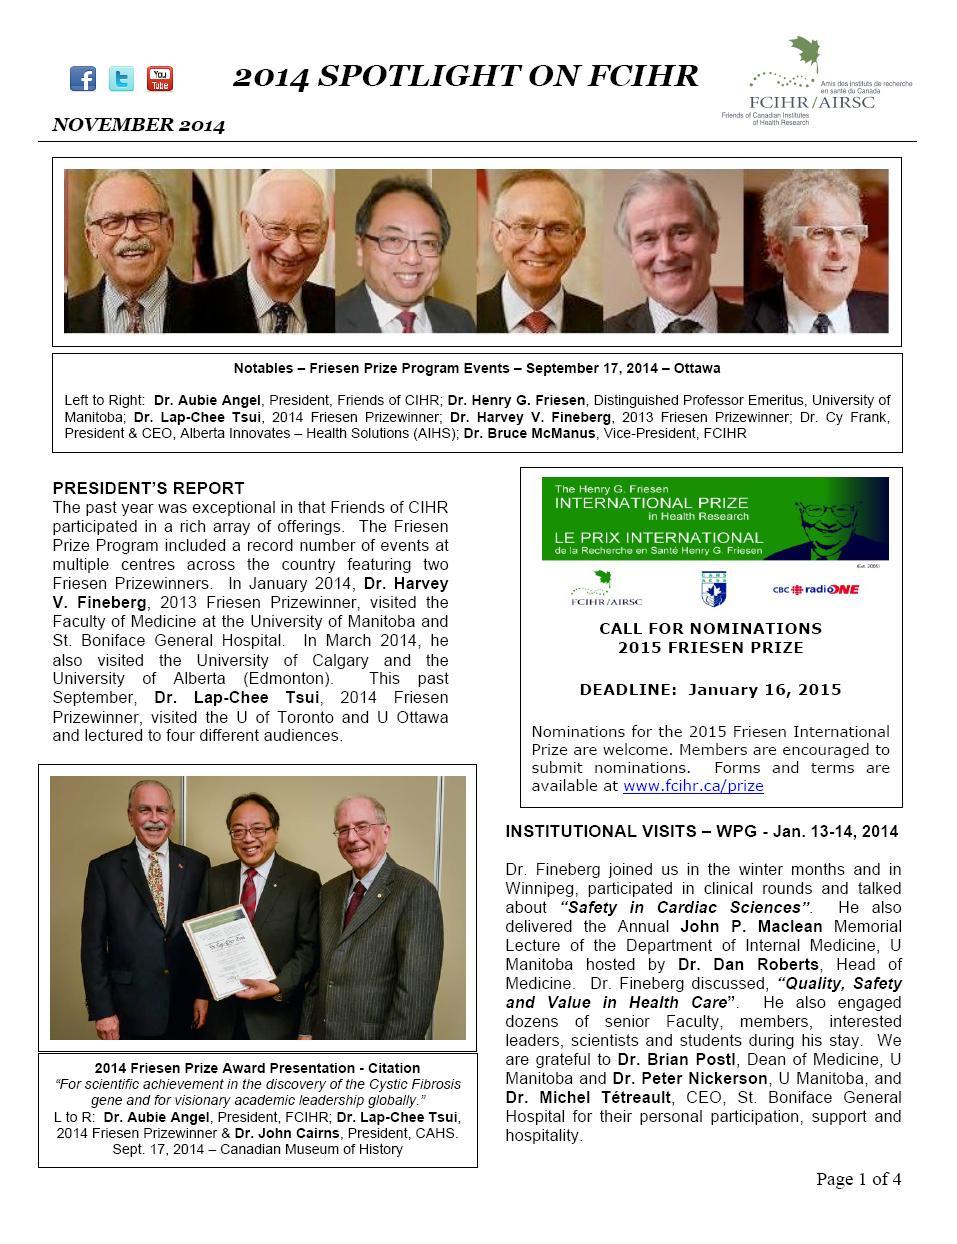 Page 1 - JPG - 2014 Spotlight Newsletter - FCIHR